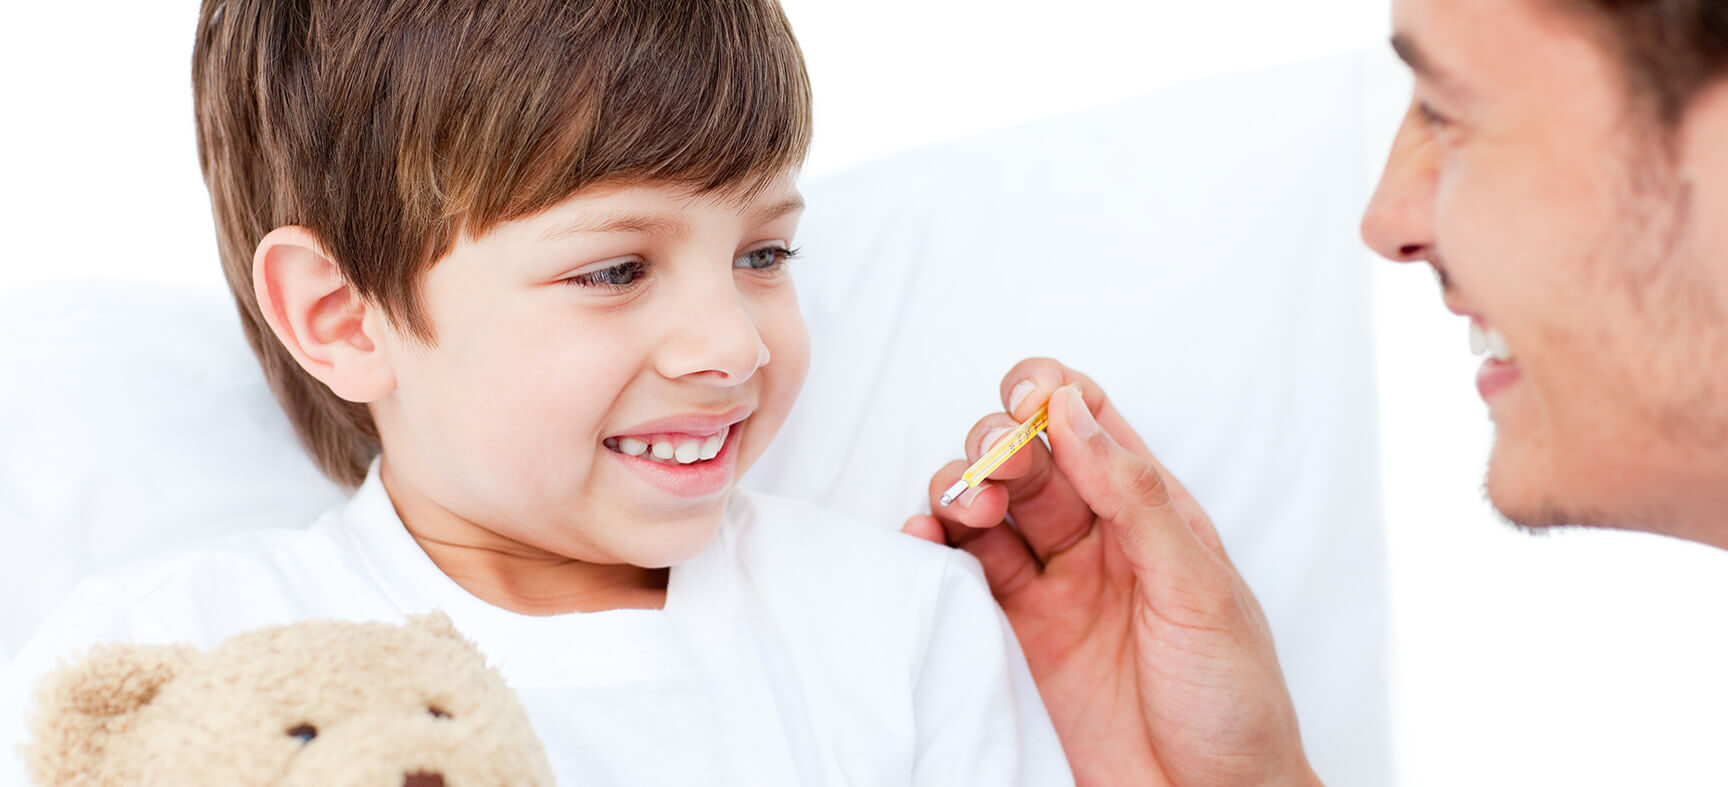 Childhood Illnesses: Cold